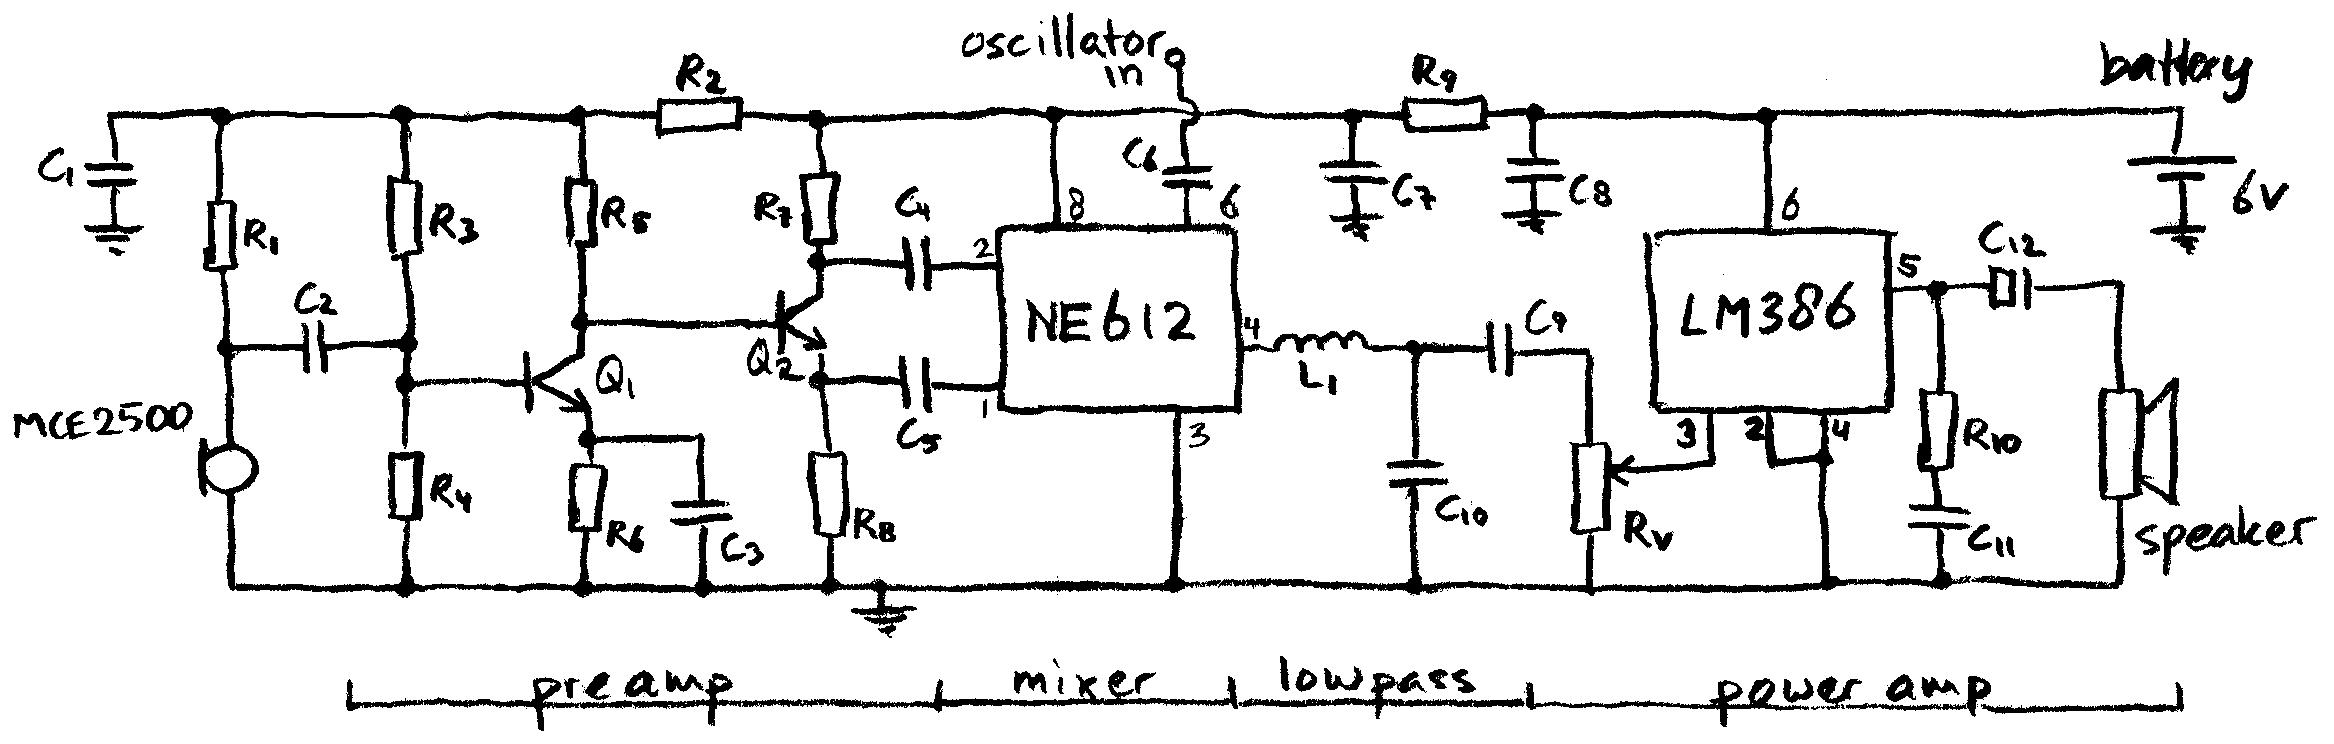 Popular Circuits Page 120 Tda1521a Stereo Audio Amplifier Circuit Ne612 Heterodyne Detector